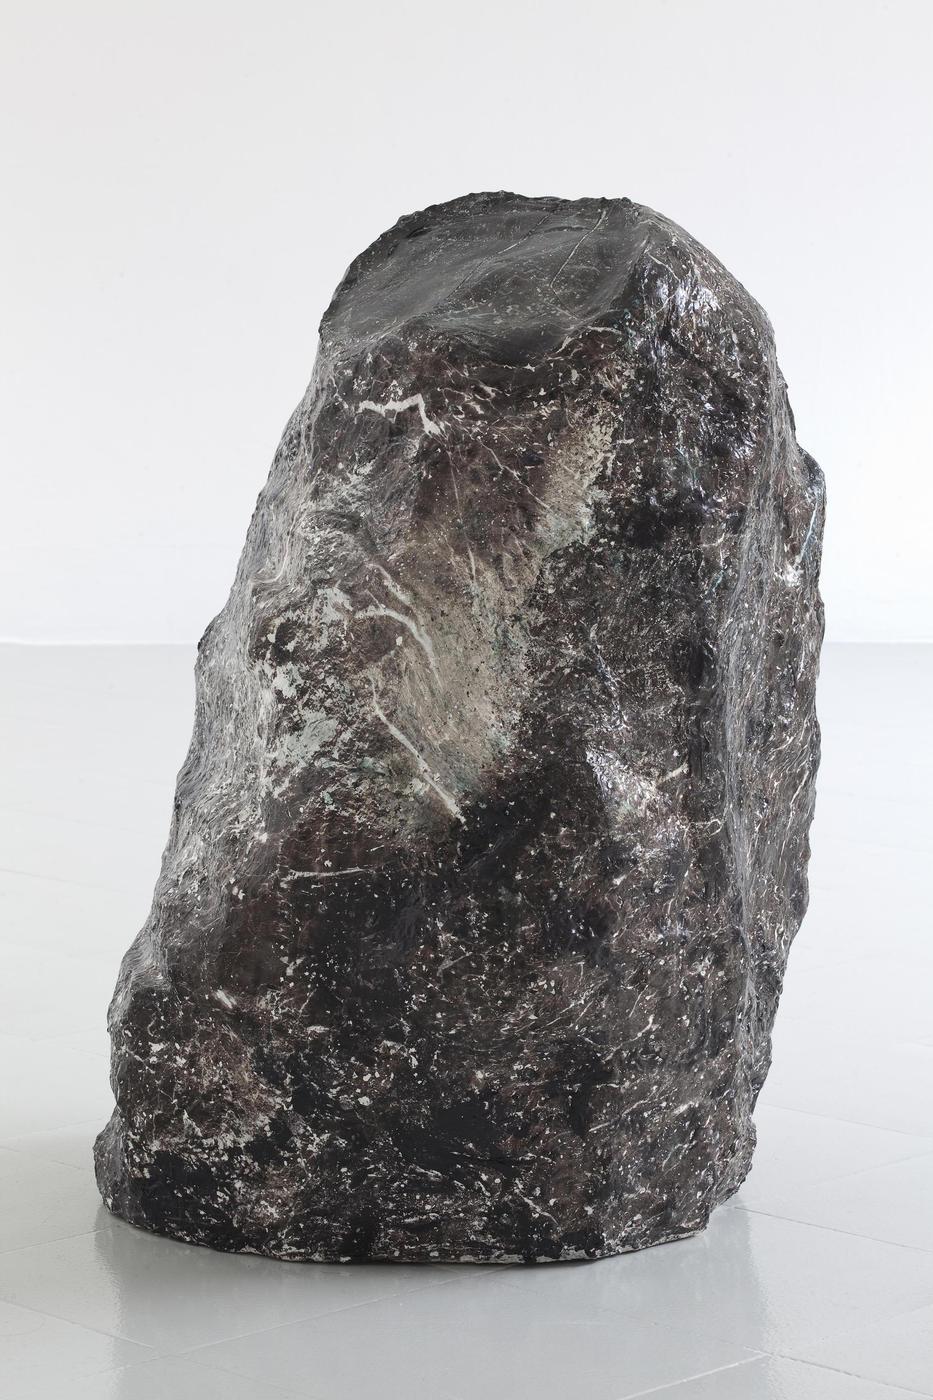 13 - Lindsay Lawson, Clara's Stone, 2016, Foam, super super molda, paper, glue, varnish, water transfer print, 80x45x84 cm